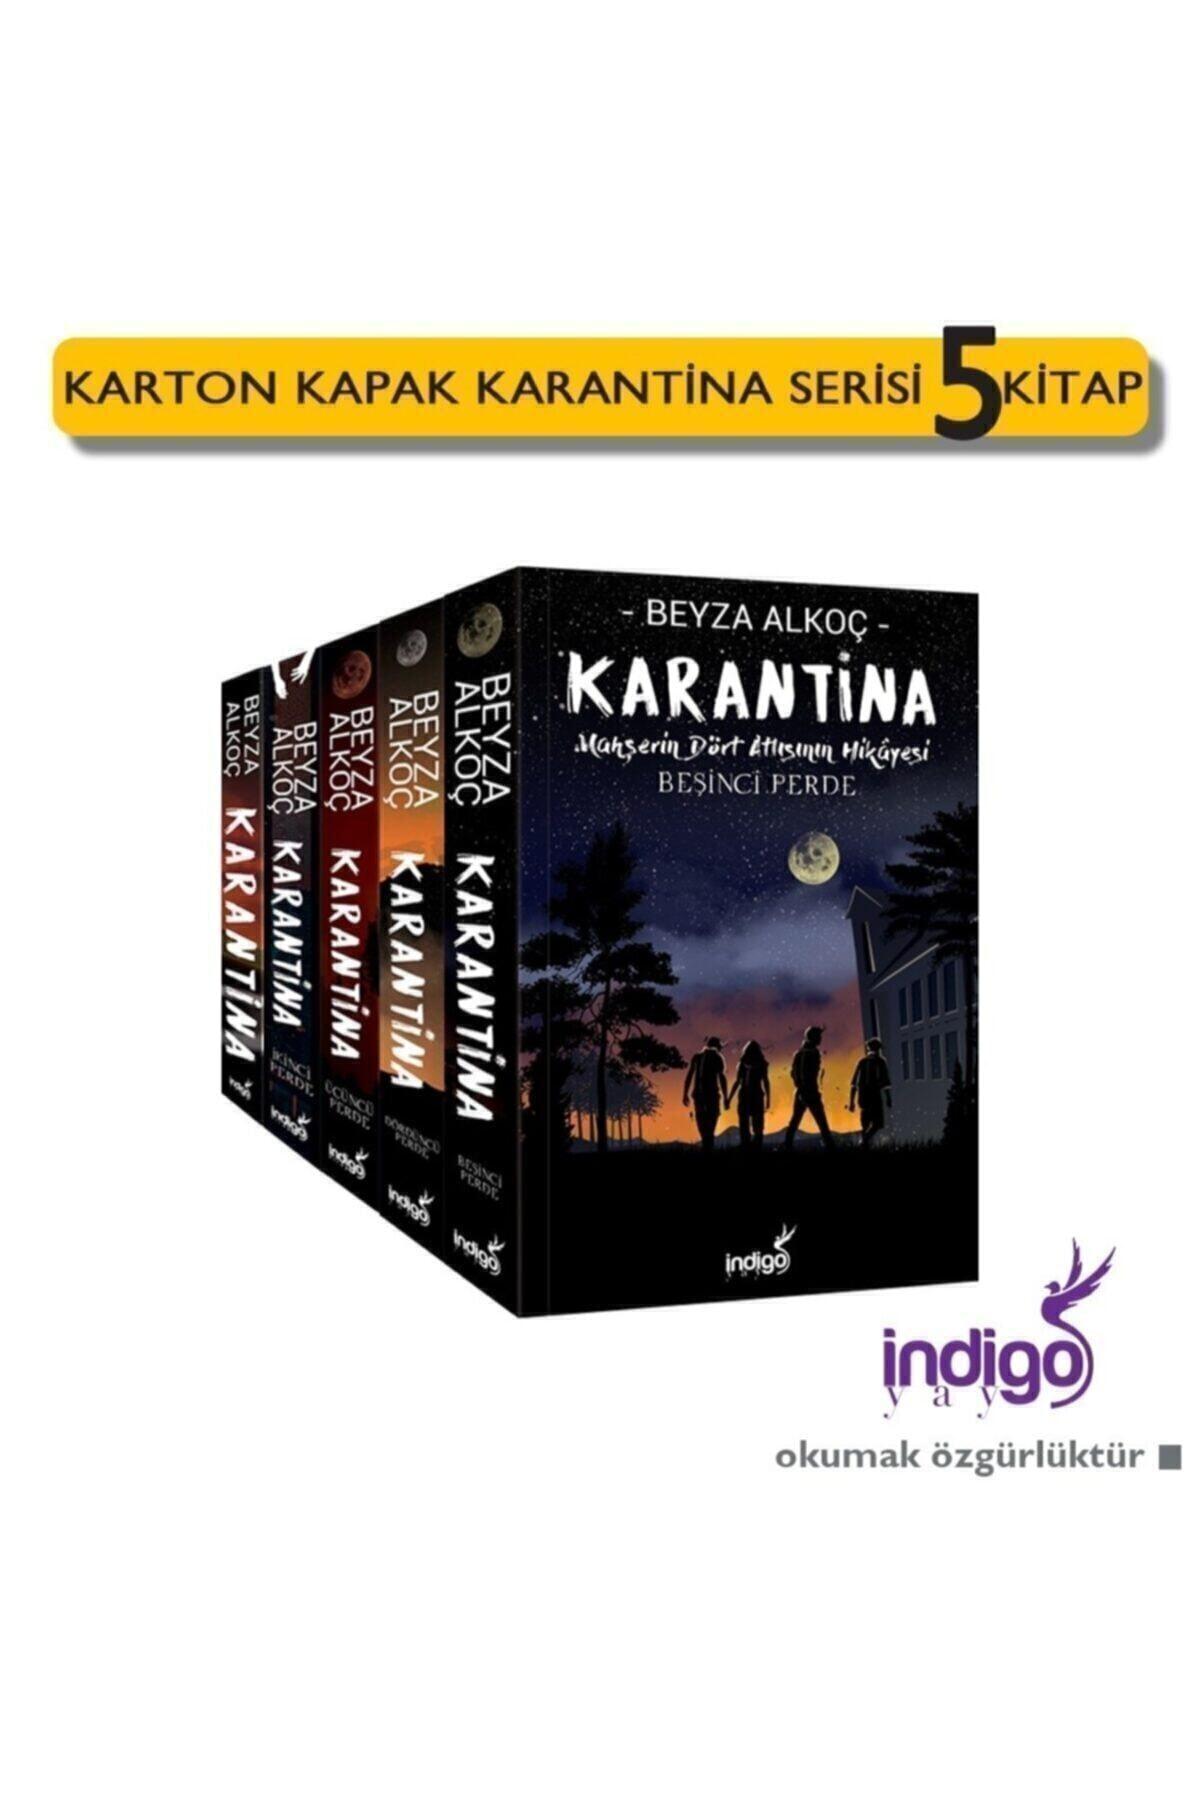 İndigo Kitap Karantina Serisi 5 Kitap Set Ciltsiz Beyza Alkoç 1